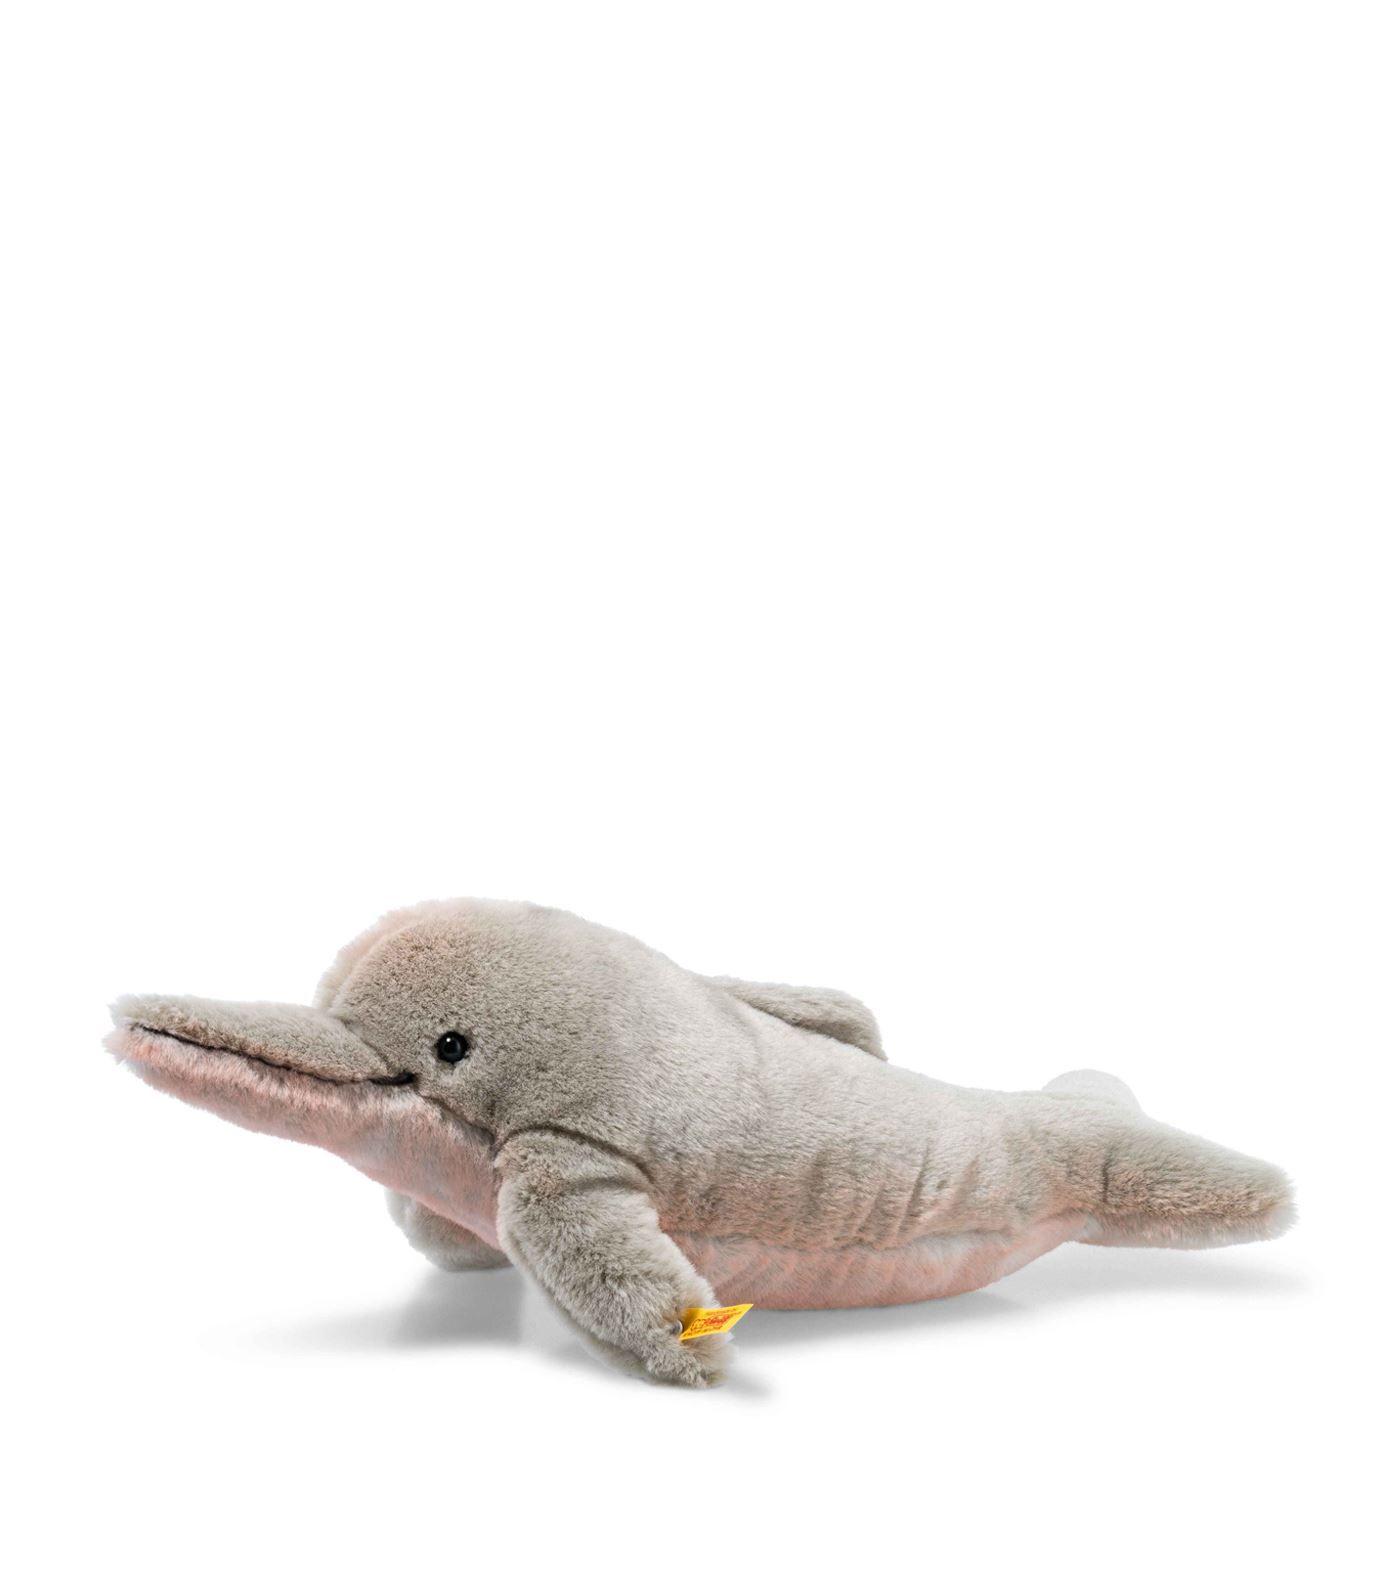 Protect Me Amazi Amazon River Dolphin 35cm Amazon River